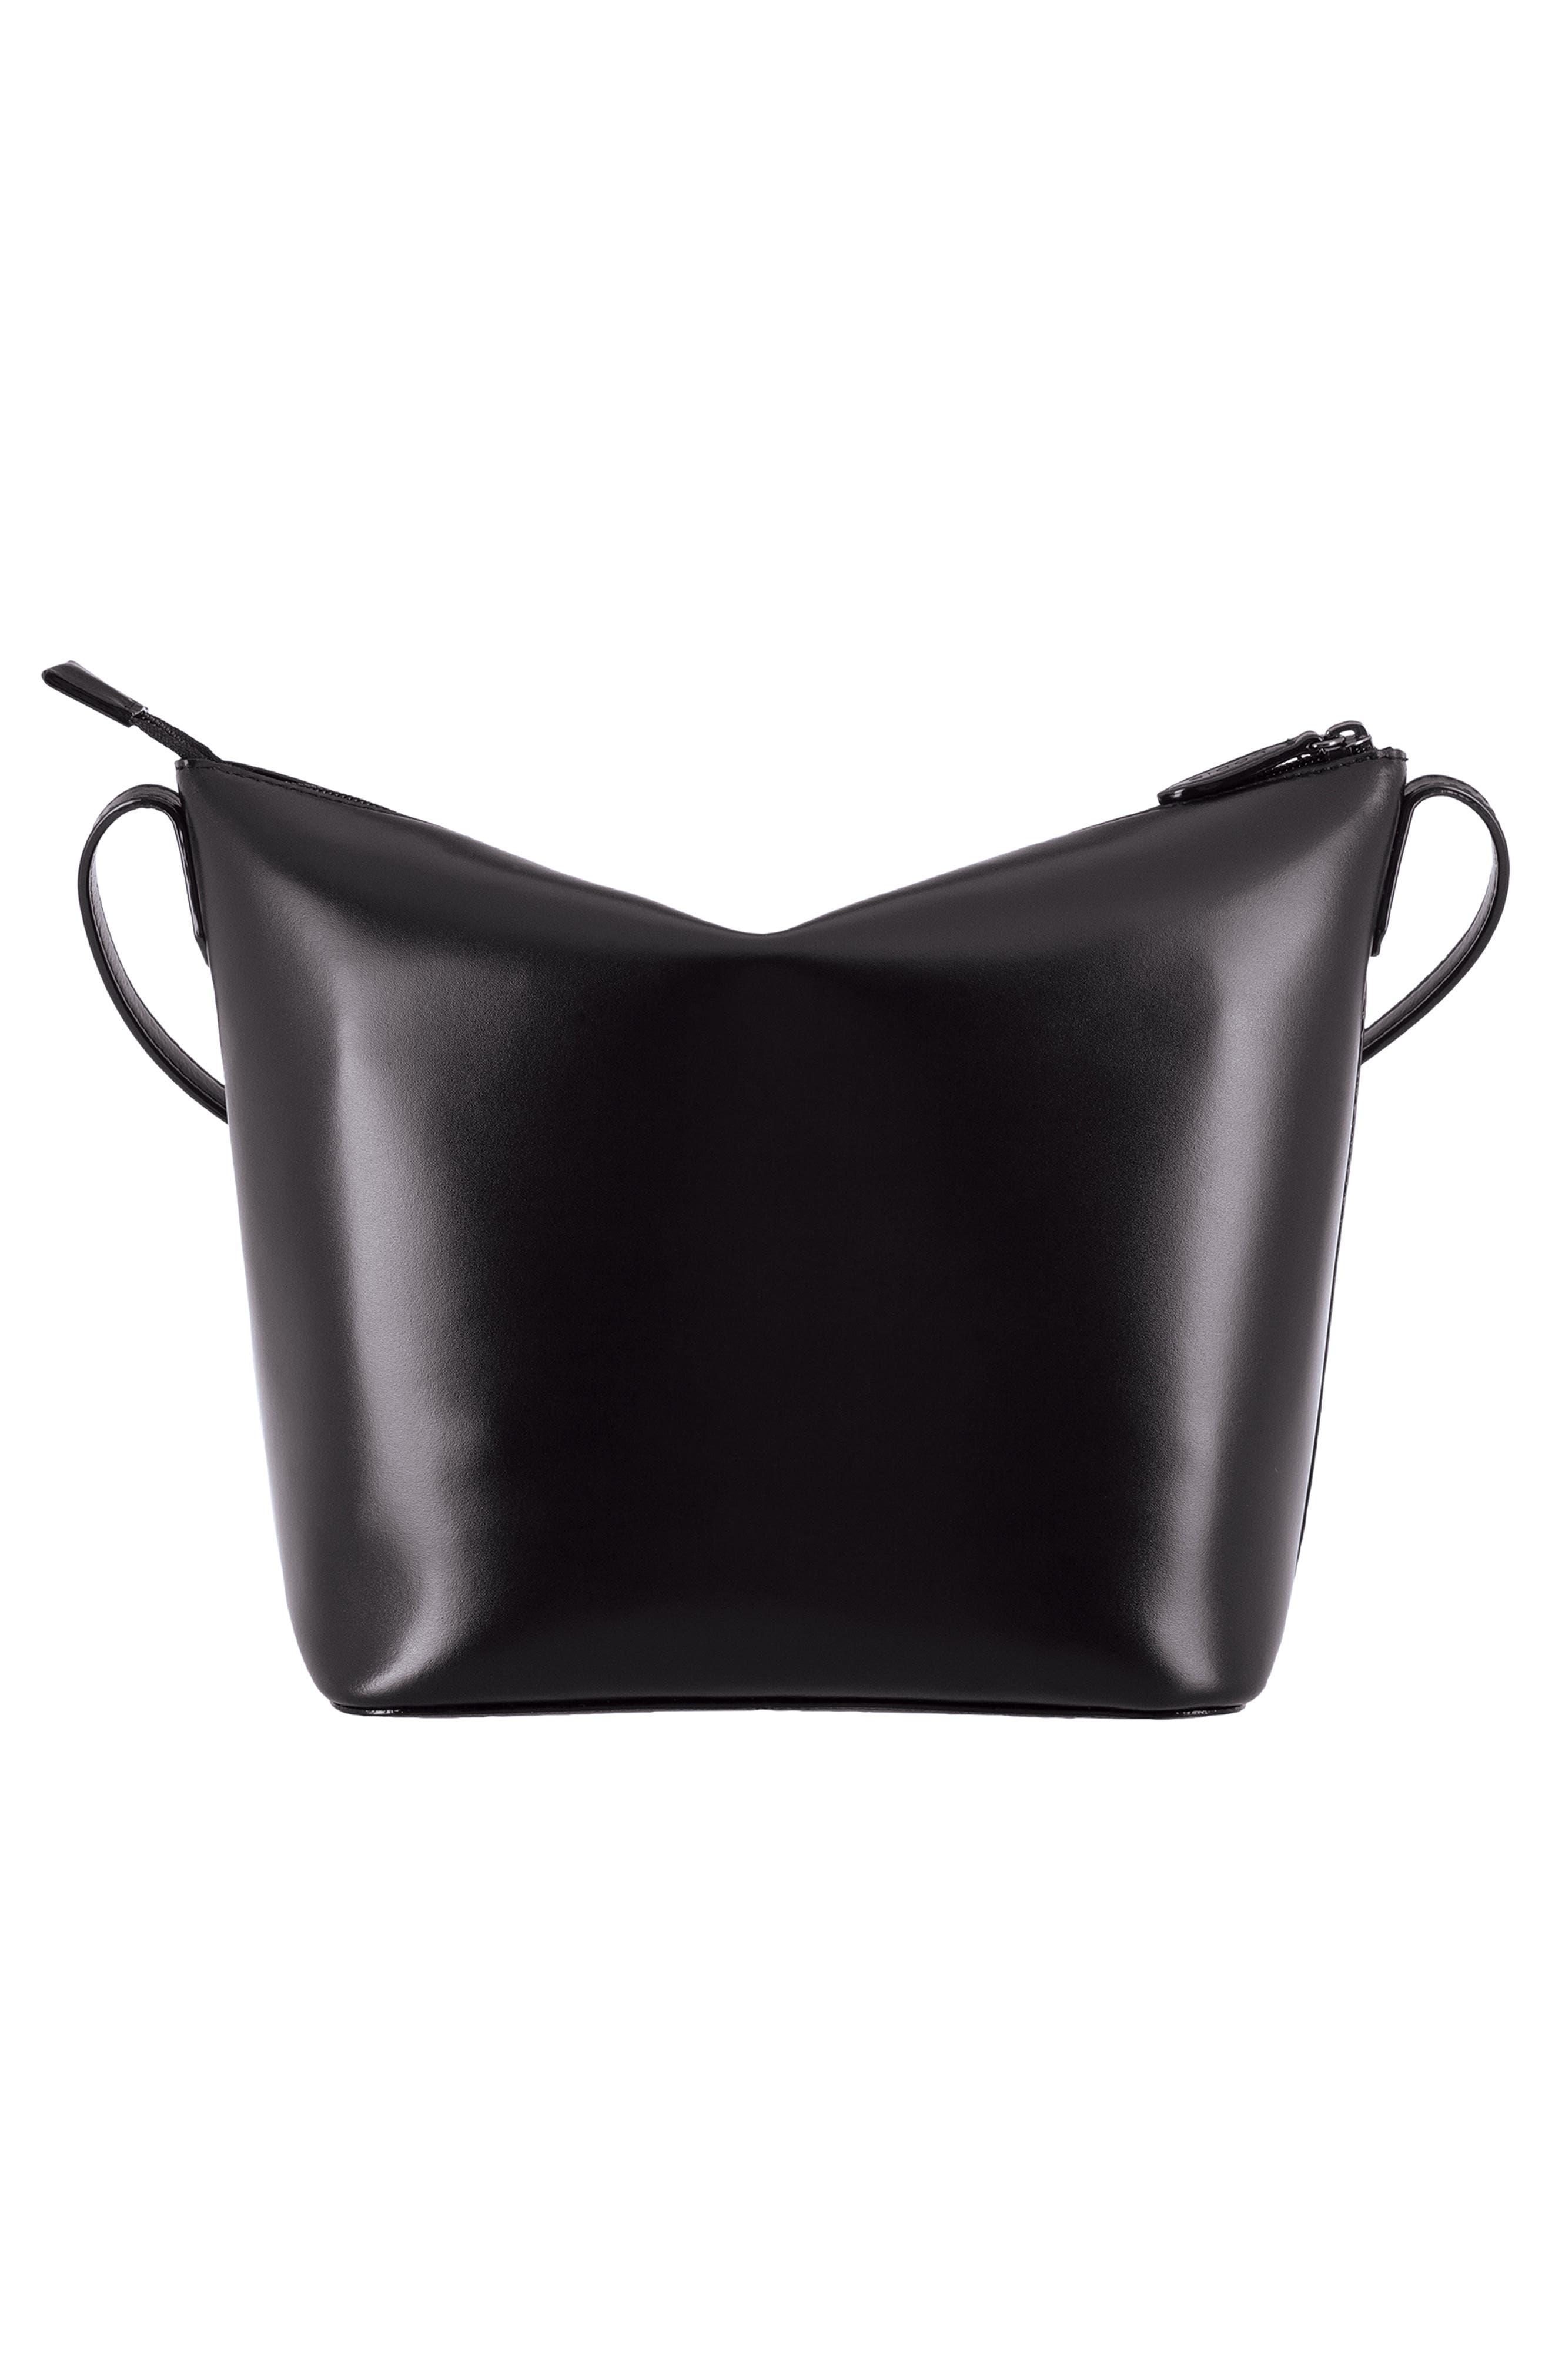 Camilla RFID Leather Crossbody Bucket Bag,                             Alternate thumbnail 2, color,                             BLACK/ BLACK